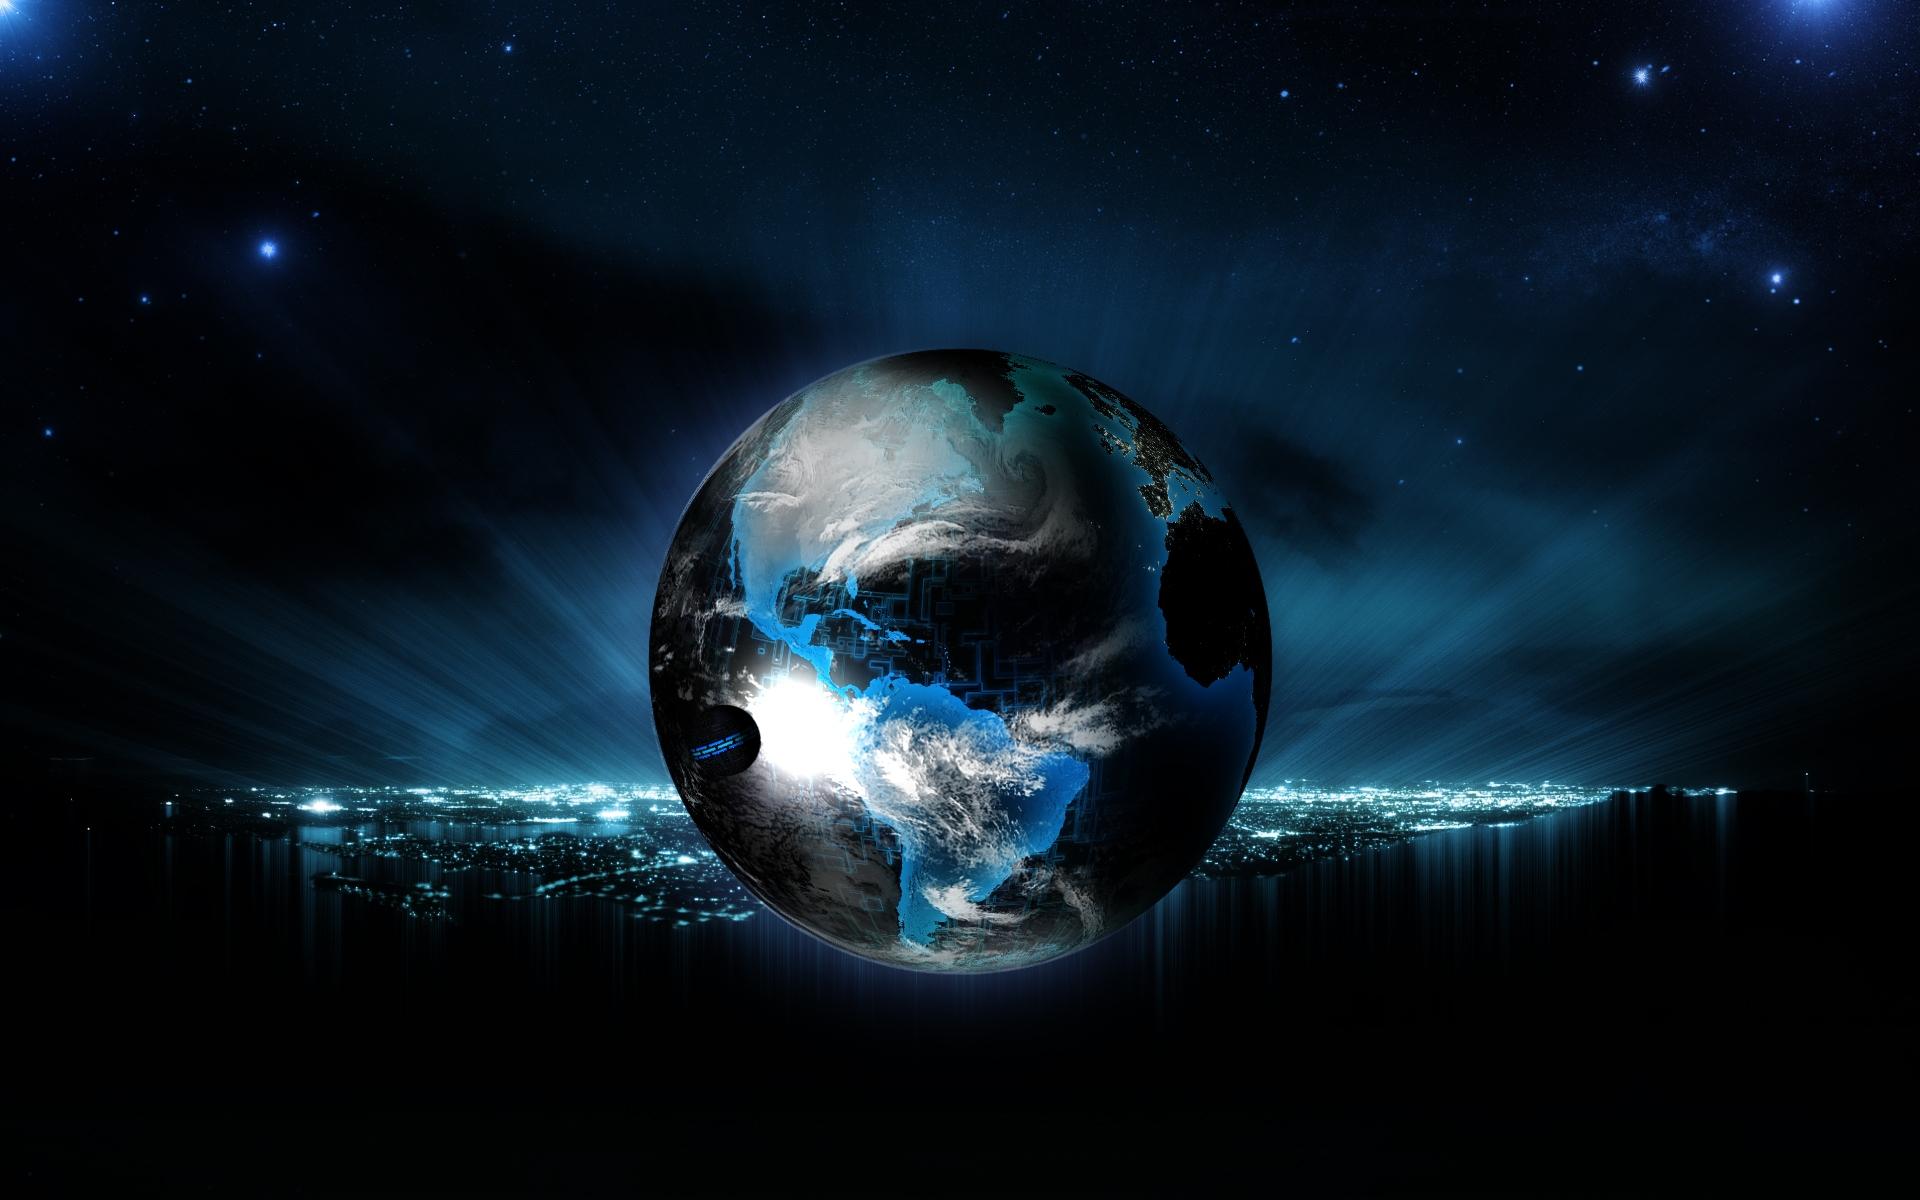 Digital Earth Wallpaper